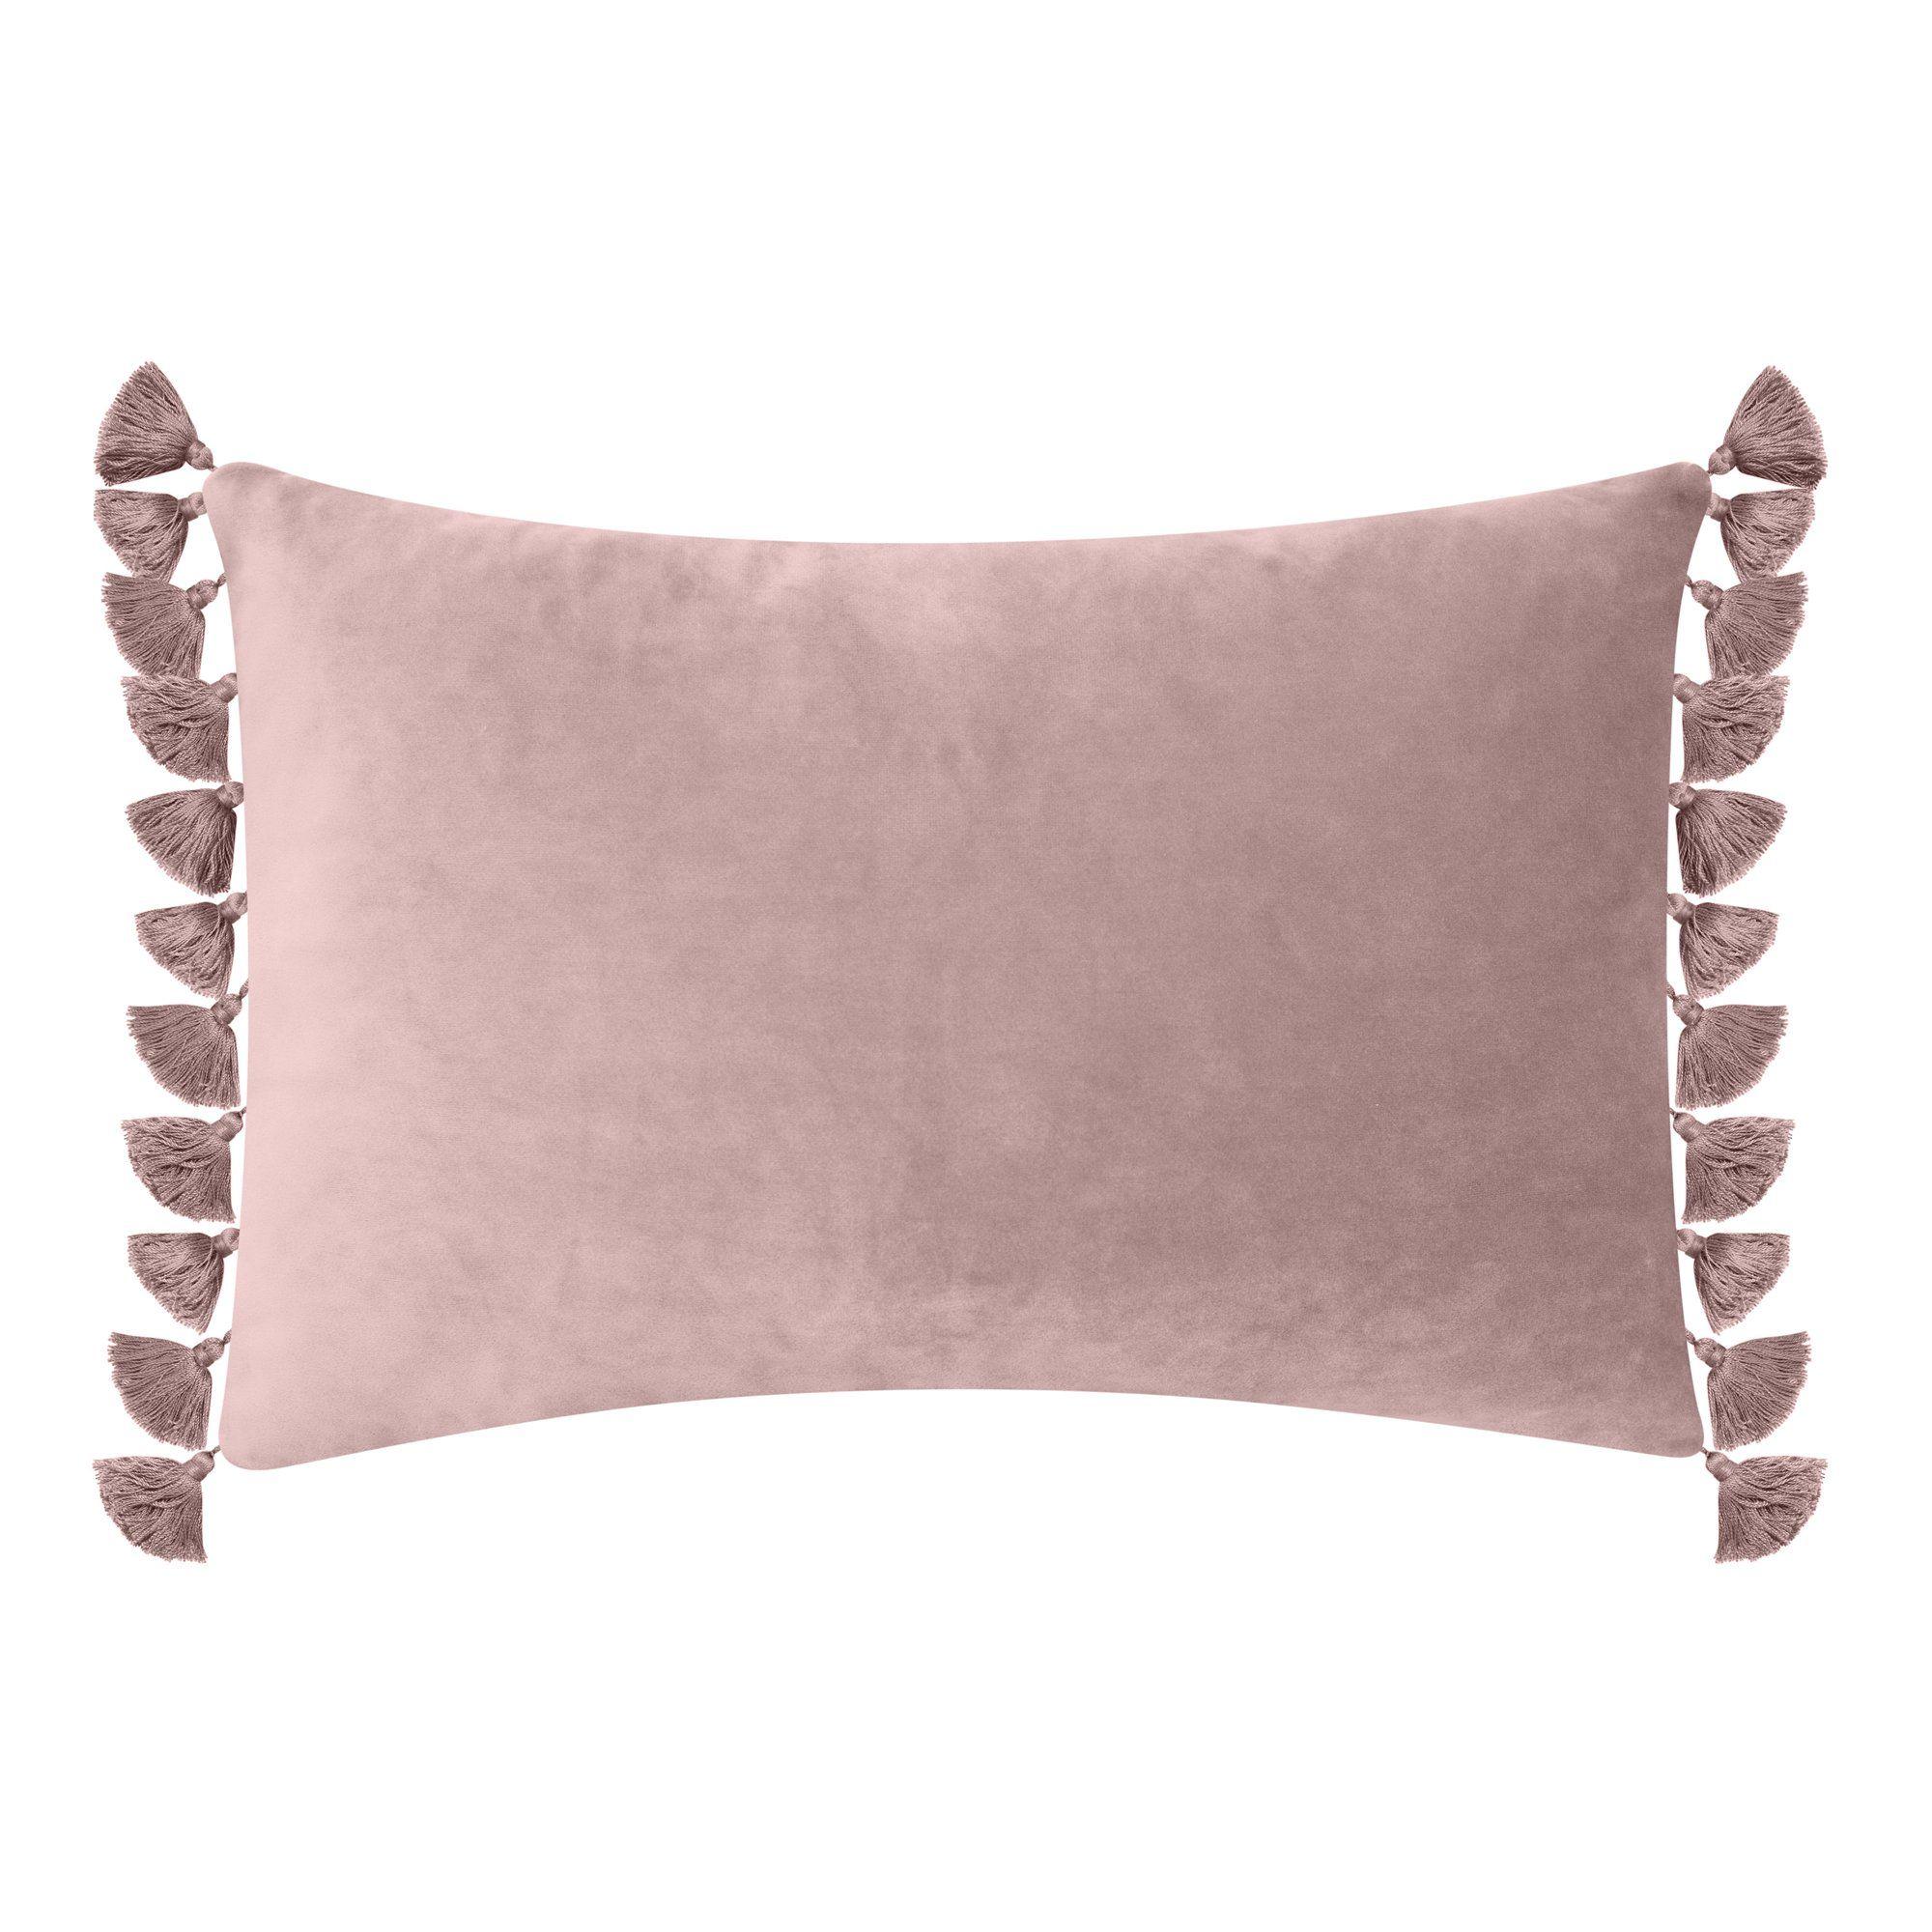 Better Homes Gardens Feather Filled Tassled Velvet Oblong Decorative Throw Pillow 14 X 20 Sunset Walmart Com In 2020 Decorative Throw Pillows Throw Pillows Decorative Throws